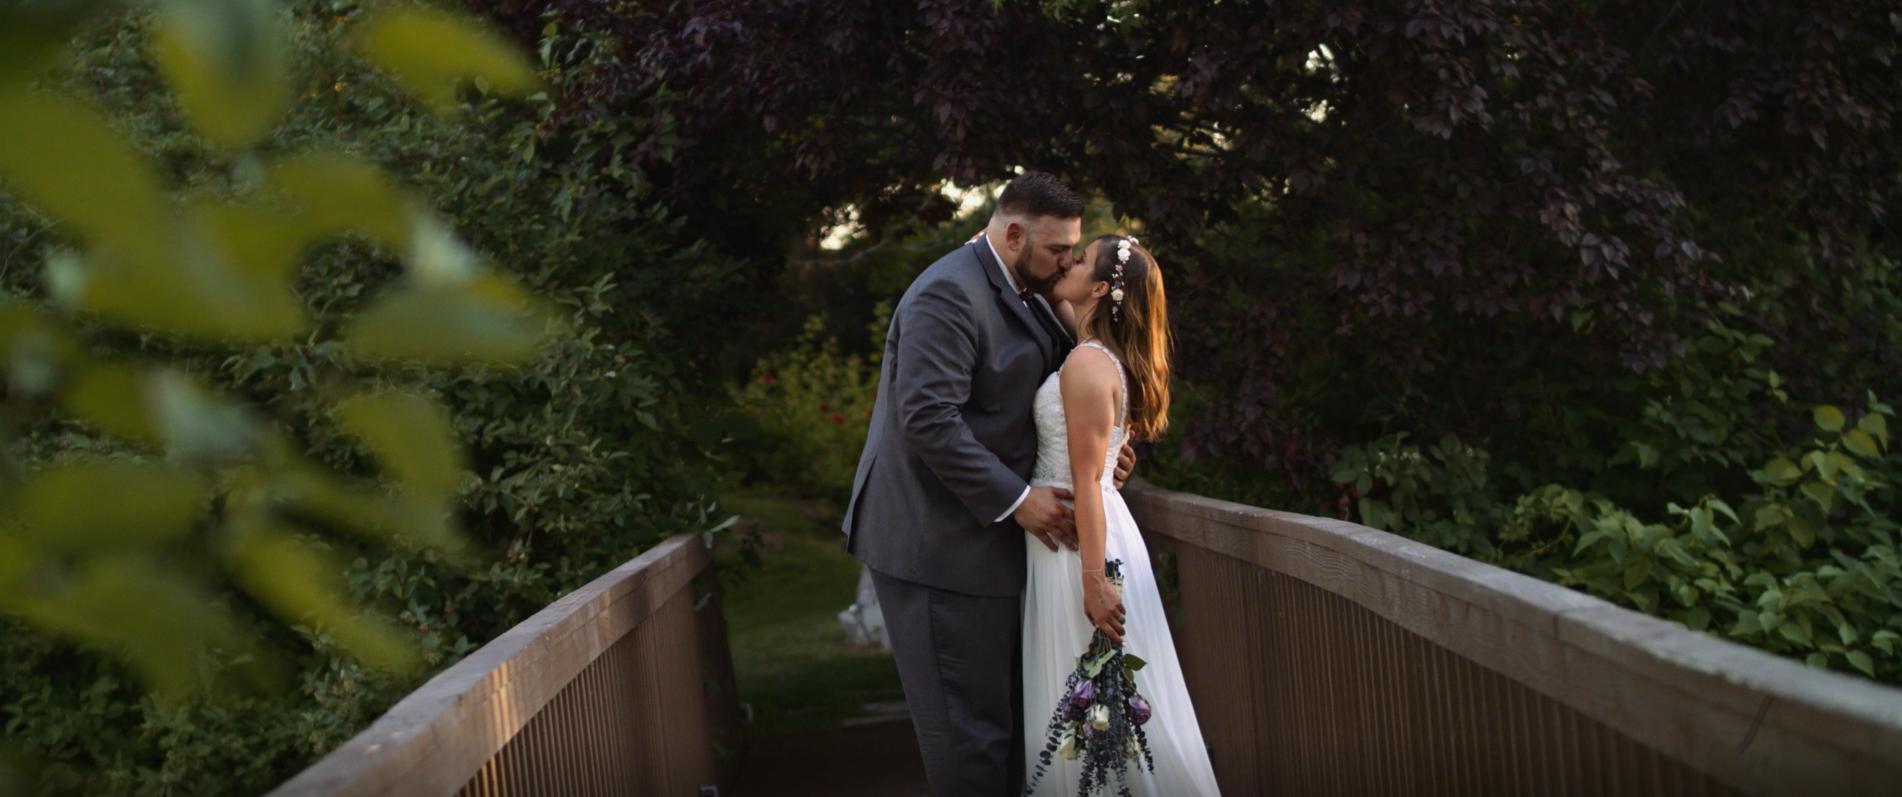 Stolen moments of the bride and groom in the secret garden!